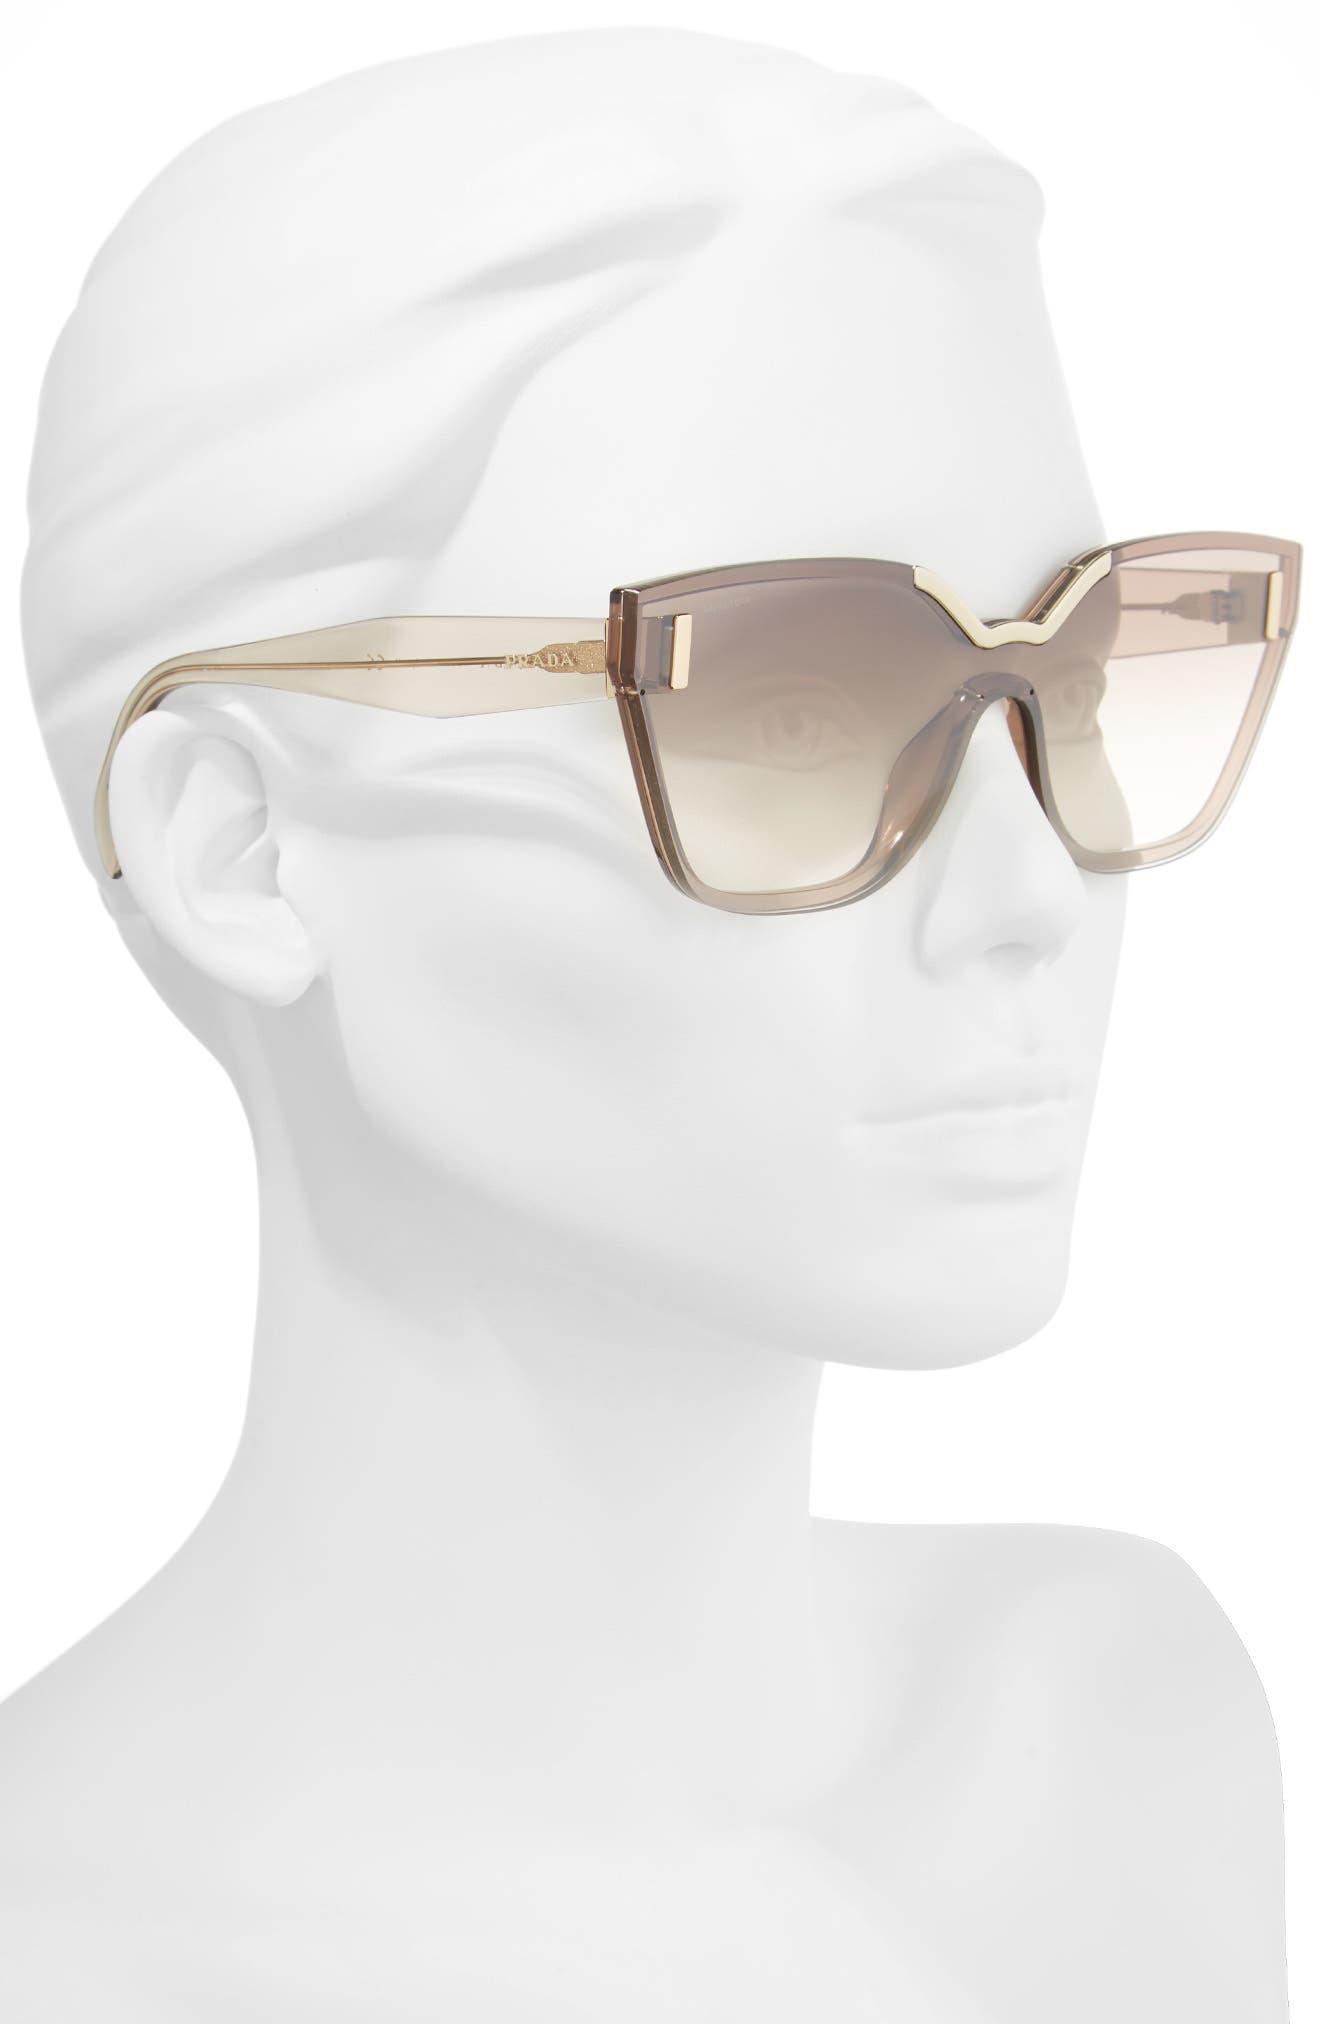 61mm Mirrored Shield Sunglasses,                             Alternate thumbnail 2, color,                             200